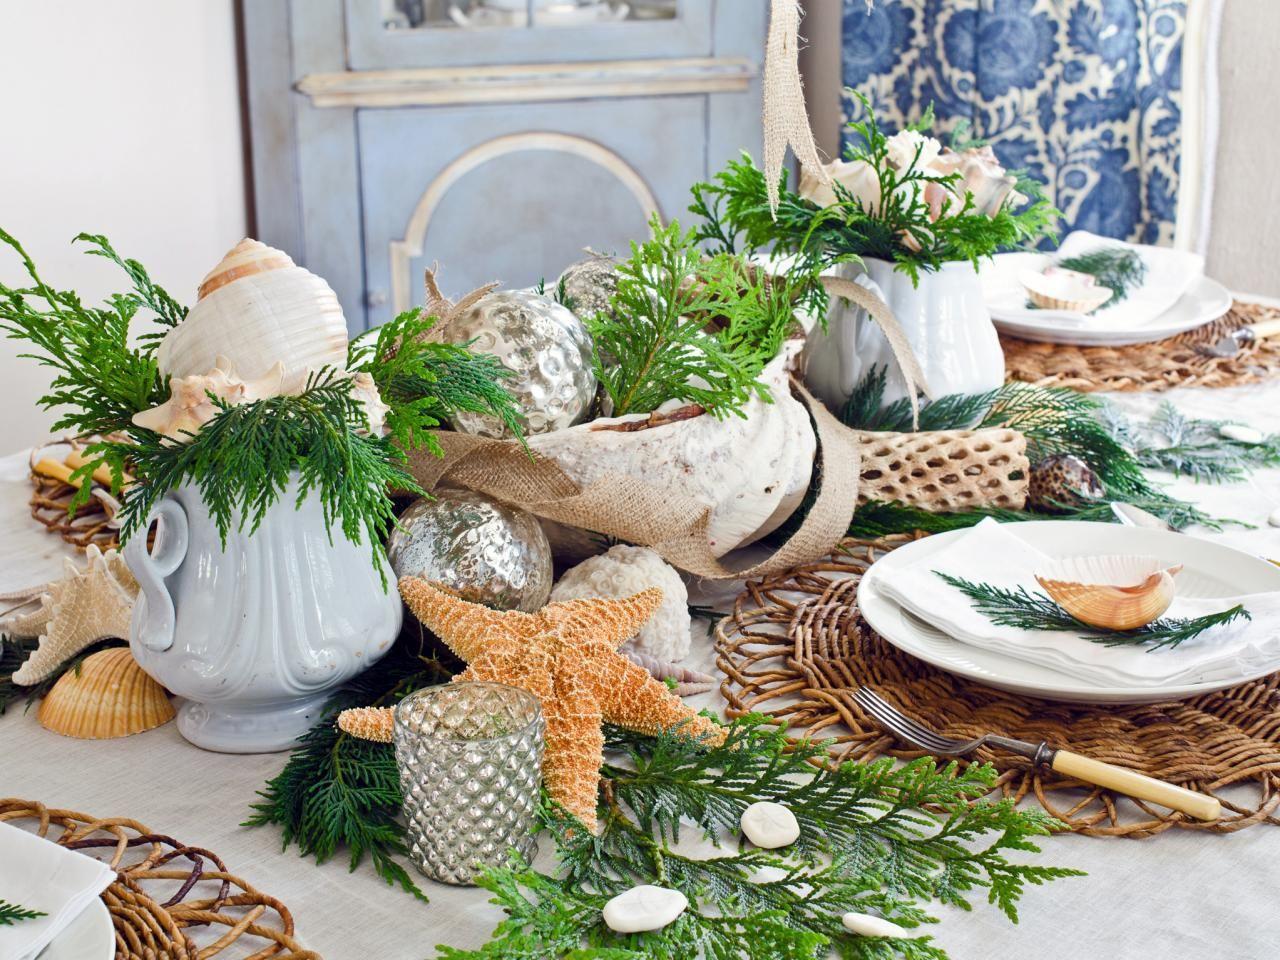 coastal-decoration-idea..-1 Give Your Home a New Festive Christmas with +90 Themes & Ideas